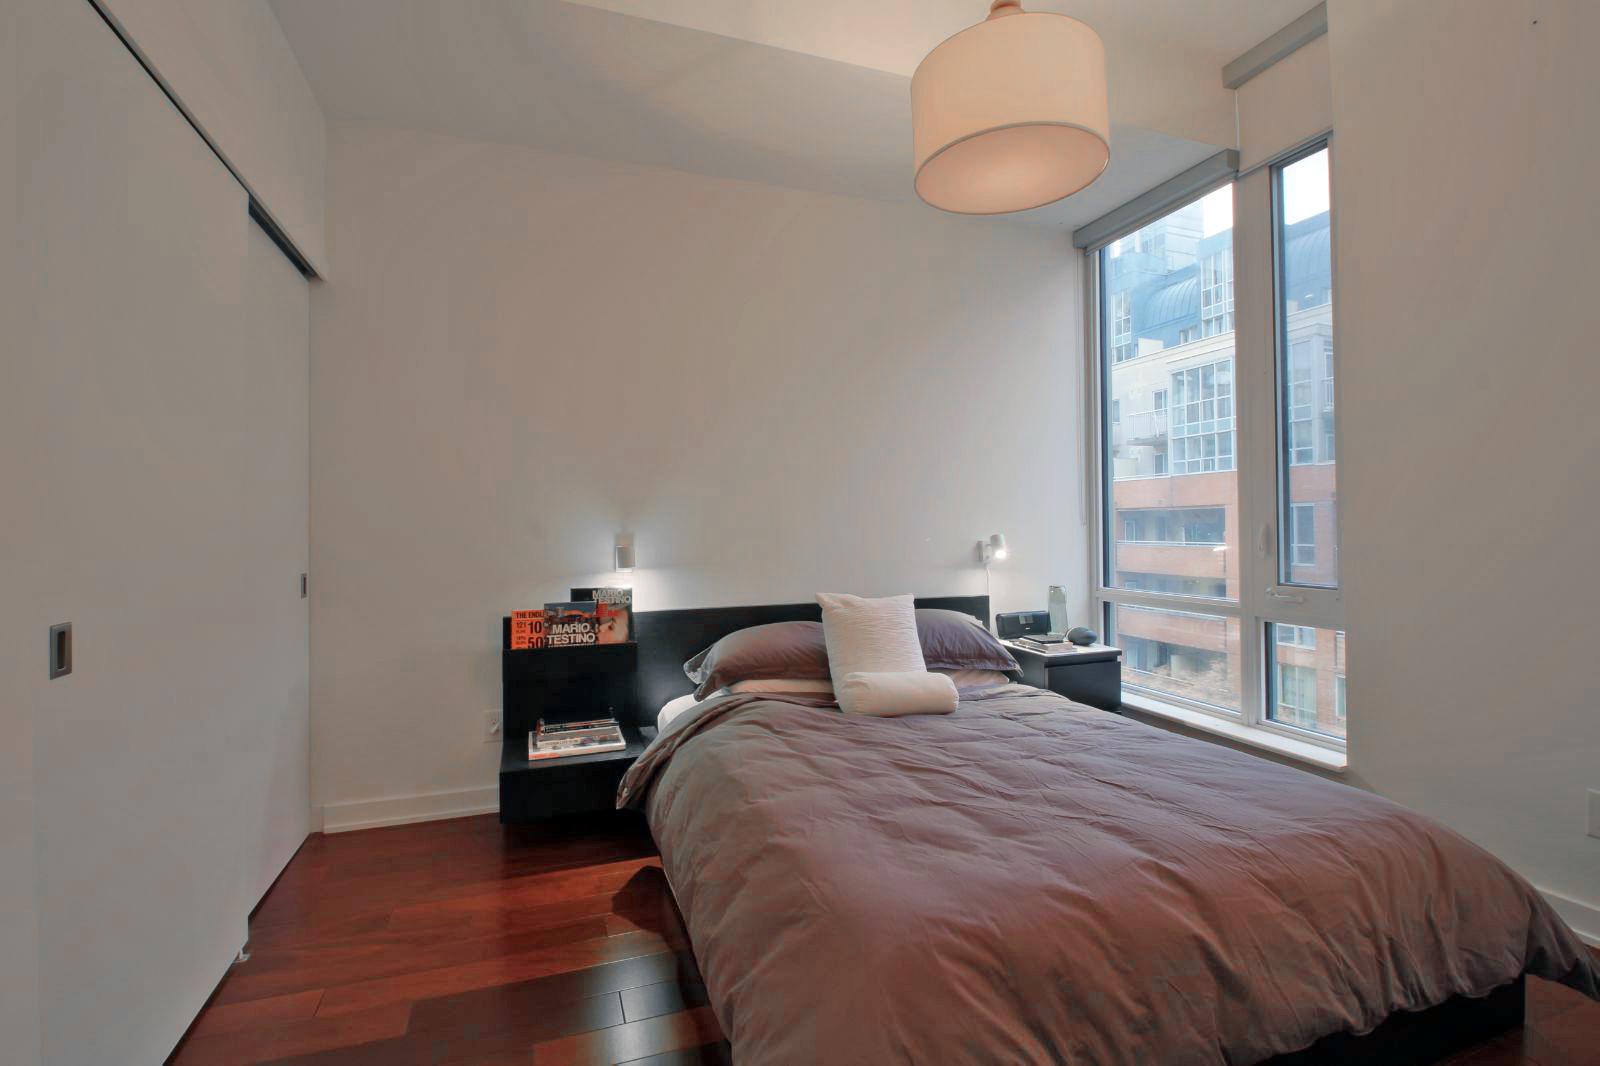 09 - Bedroom.jpg